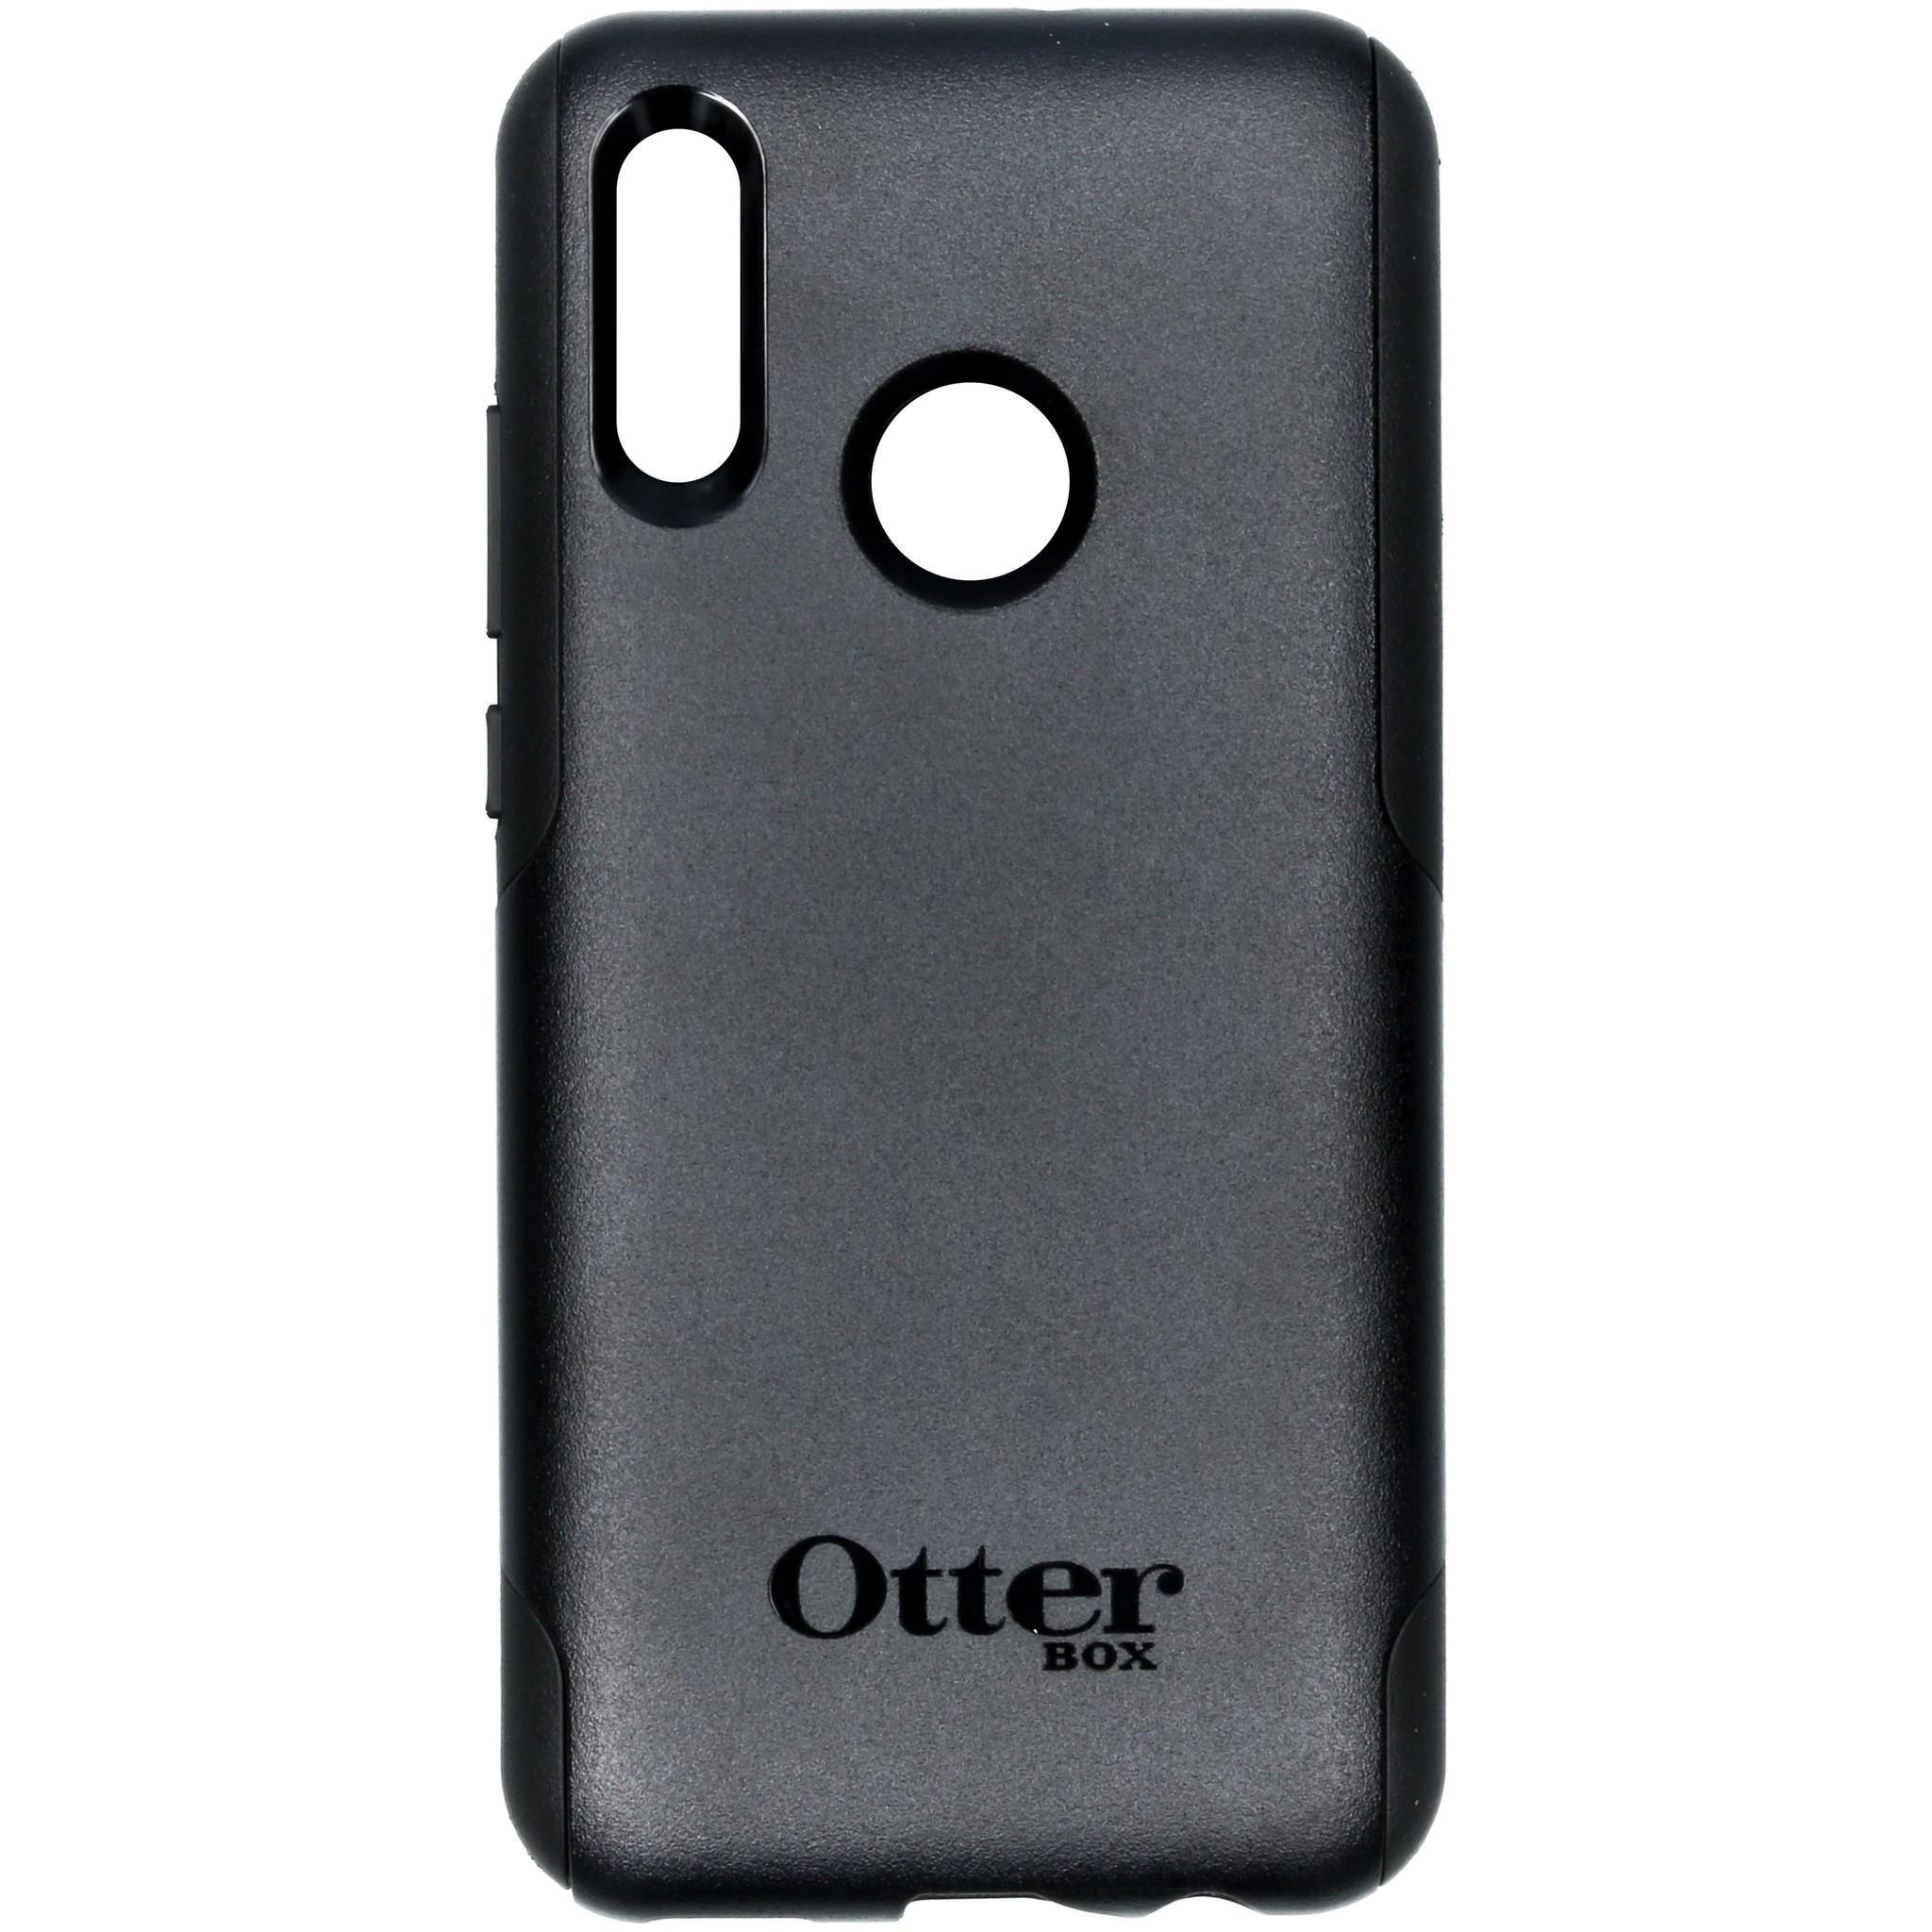 outlet store d6e5f c0ed6 OtterBox Commuter Case Huawei P Smart (2019)